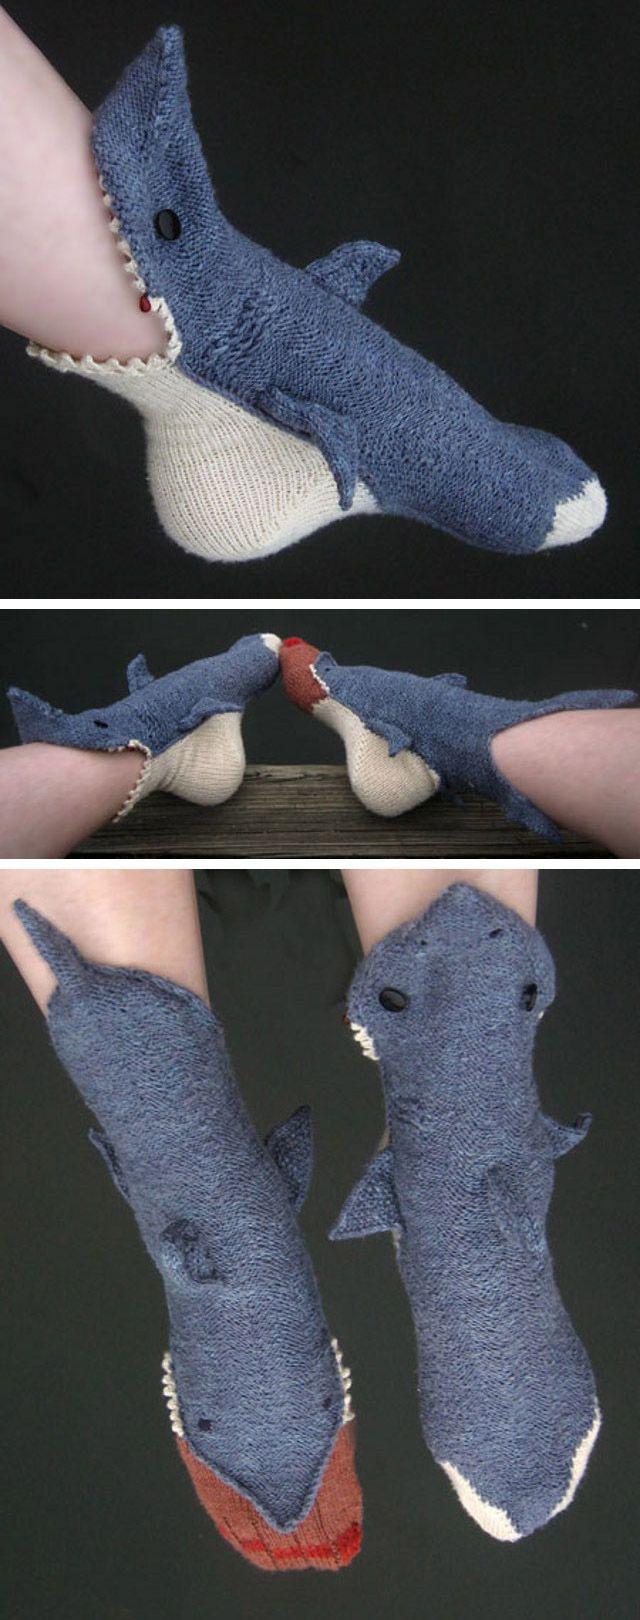 Shark socks!